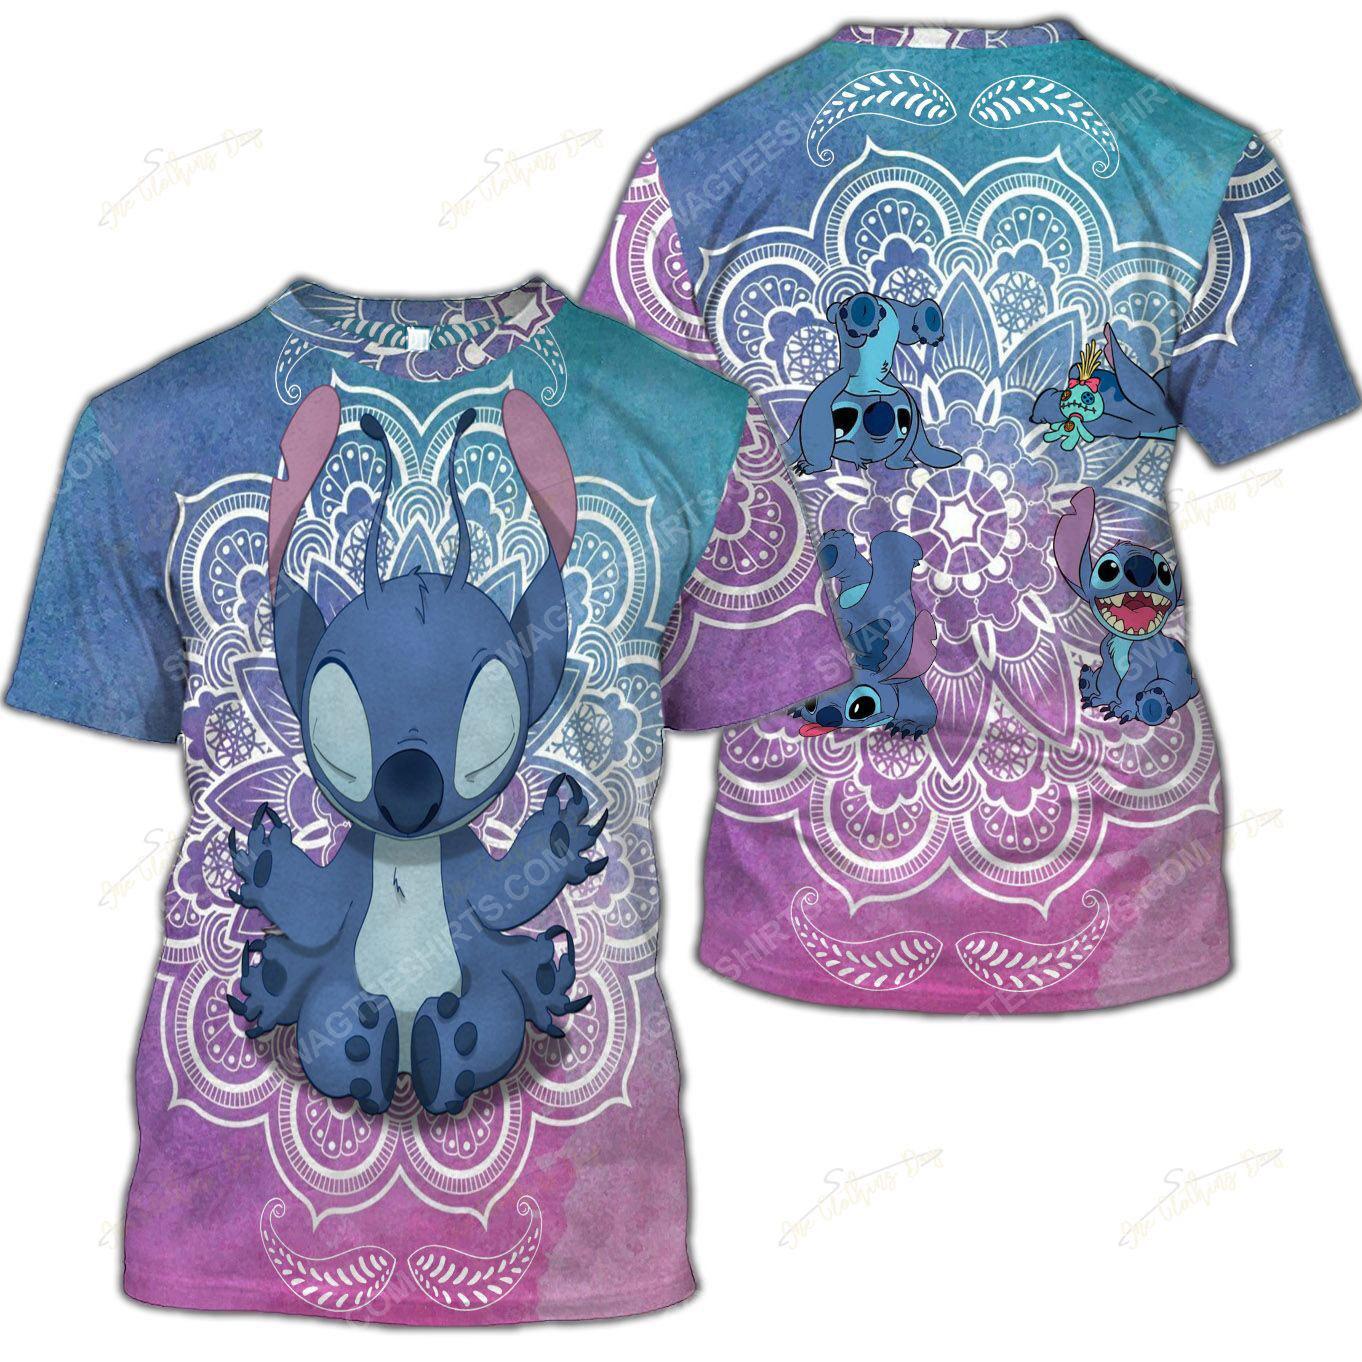 The stitch namaste full printed shirt 3(1)